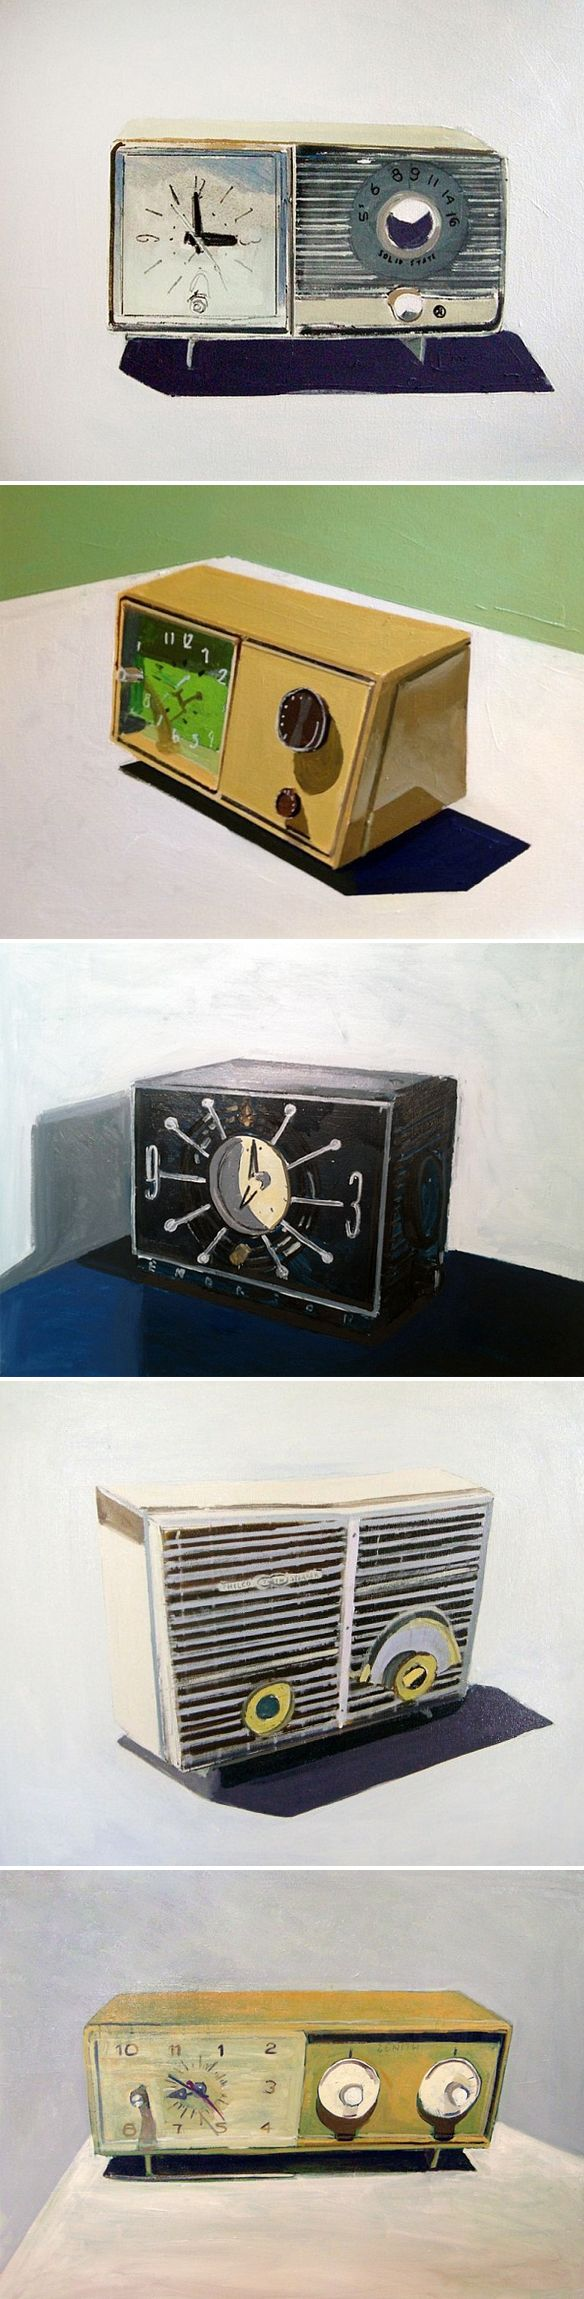 clocks, radios, and clock radios... paintings by jessica brilli